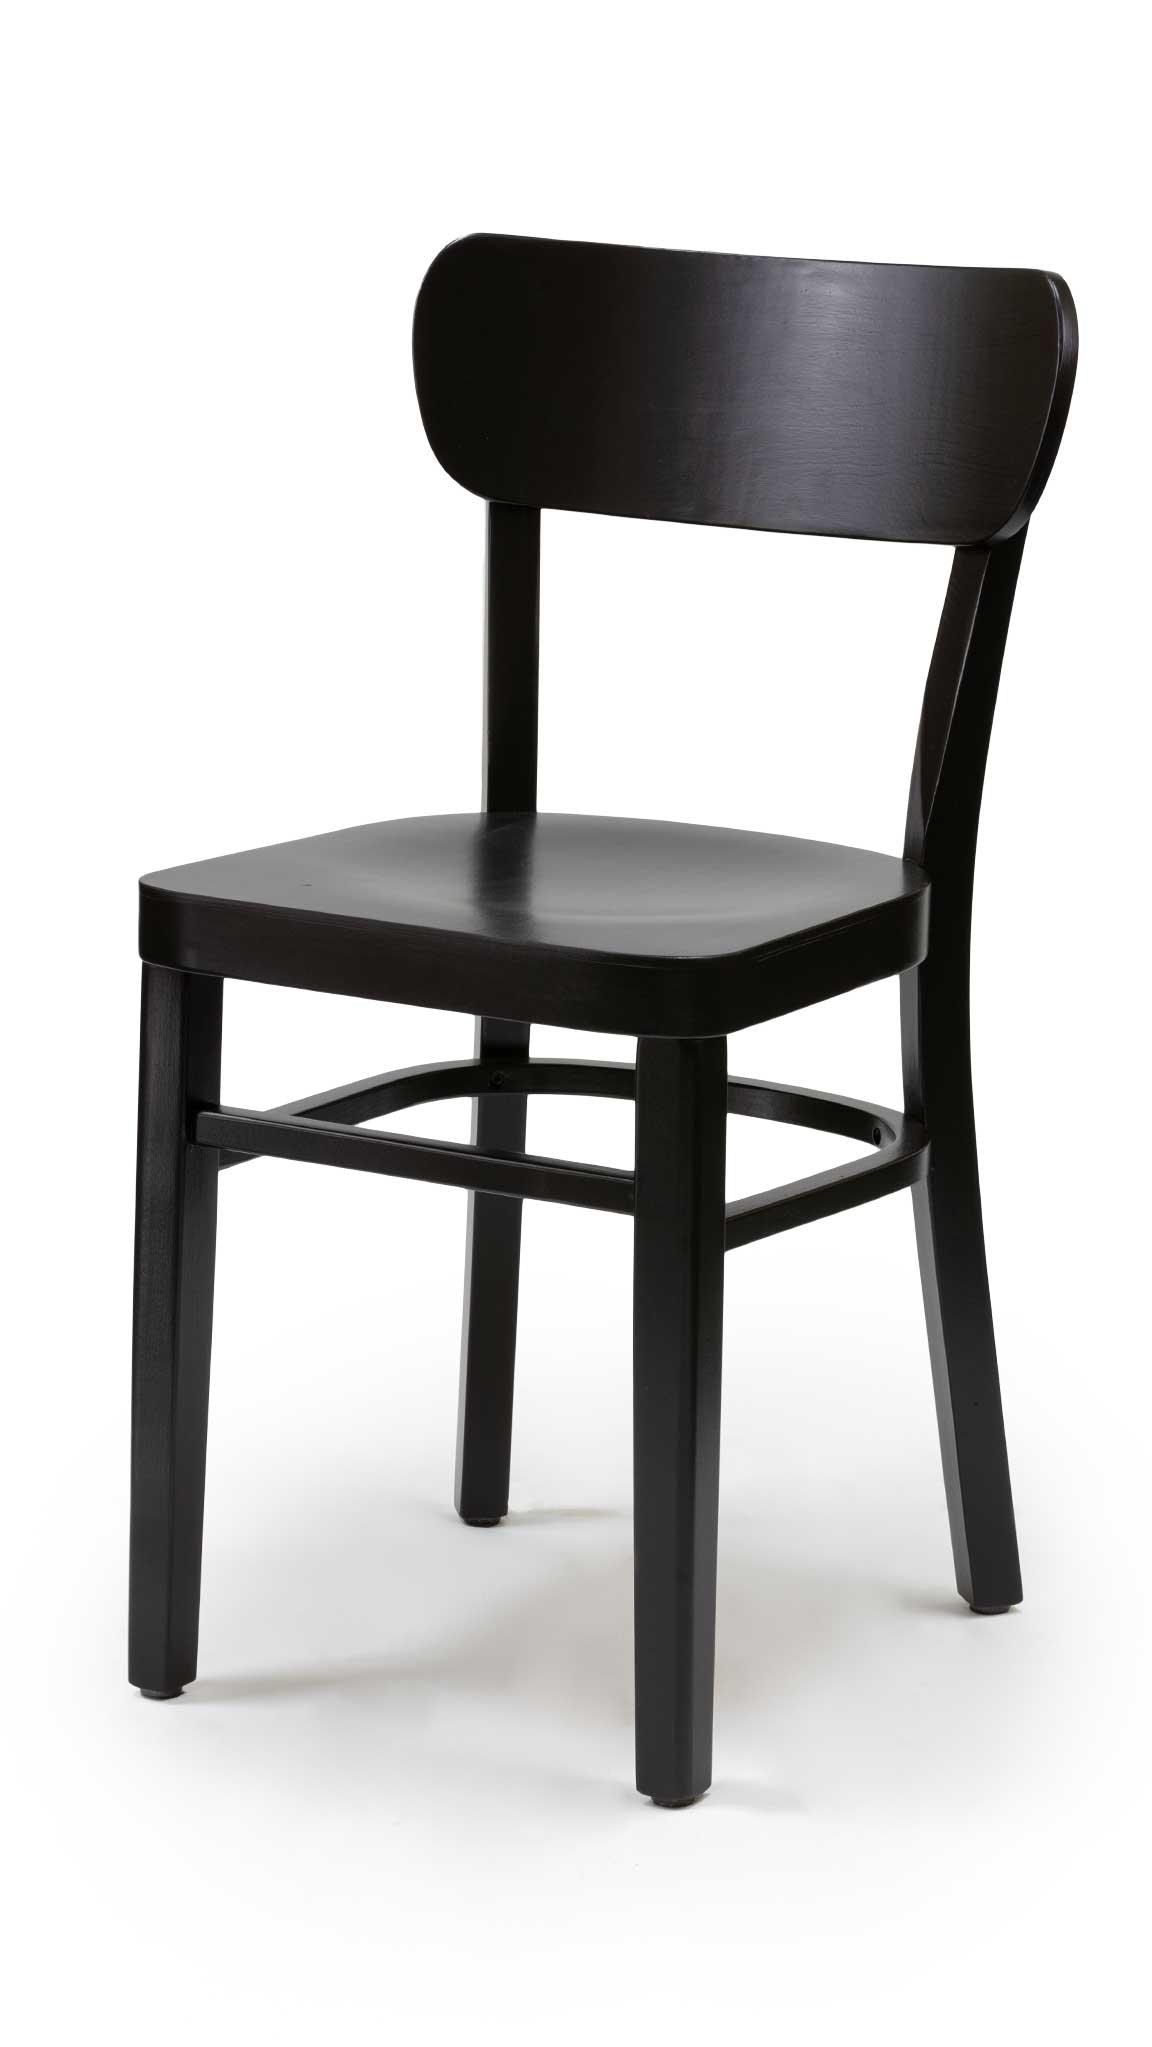 Черен стол от масив бук - 1322S